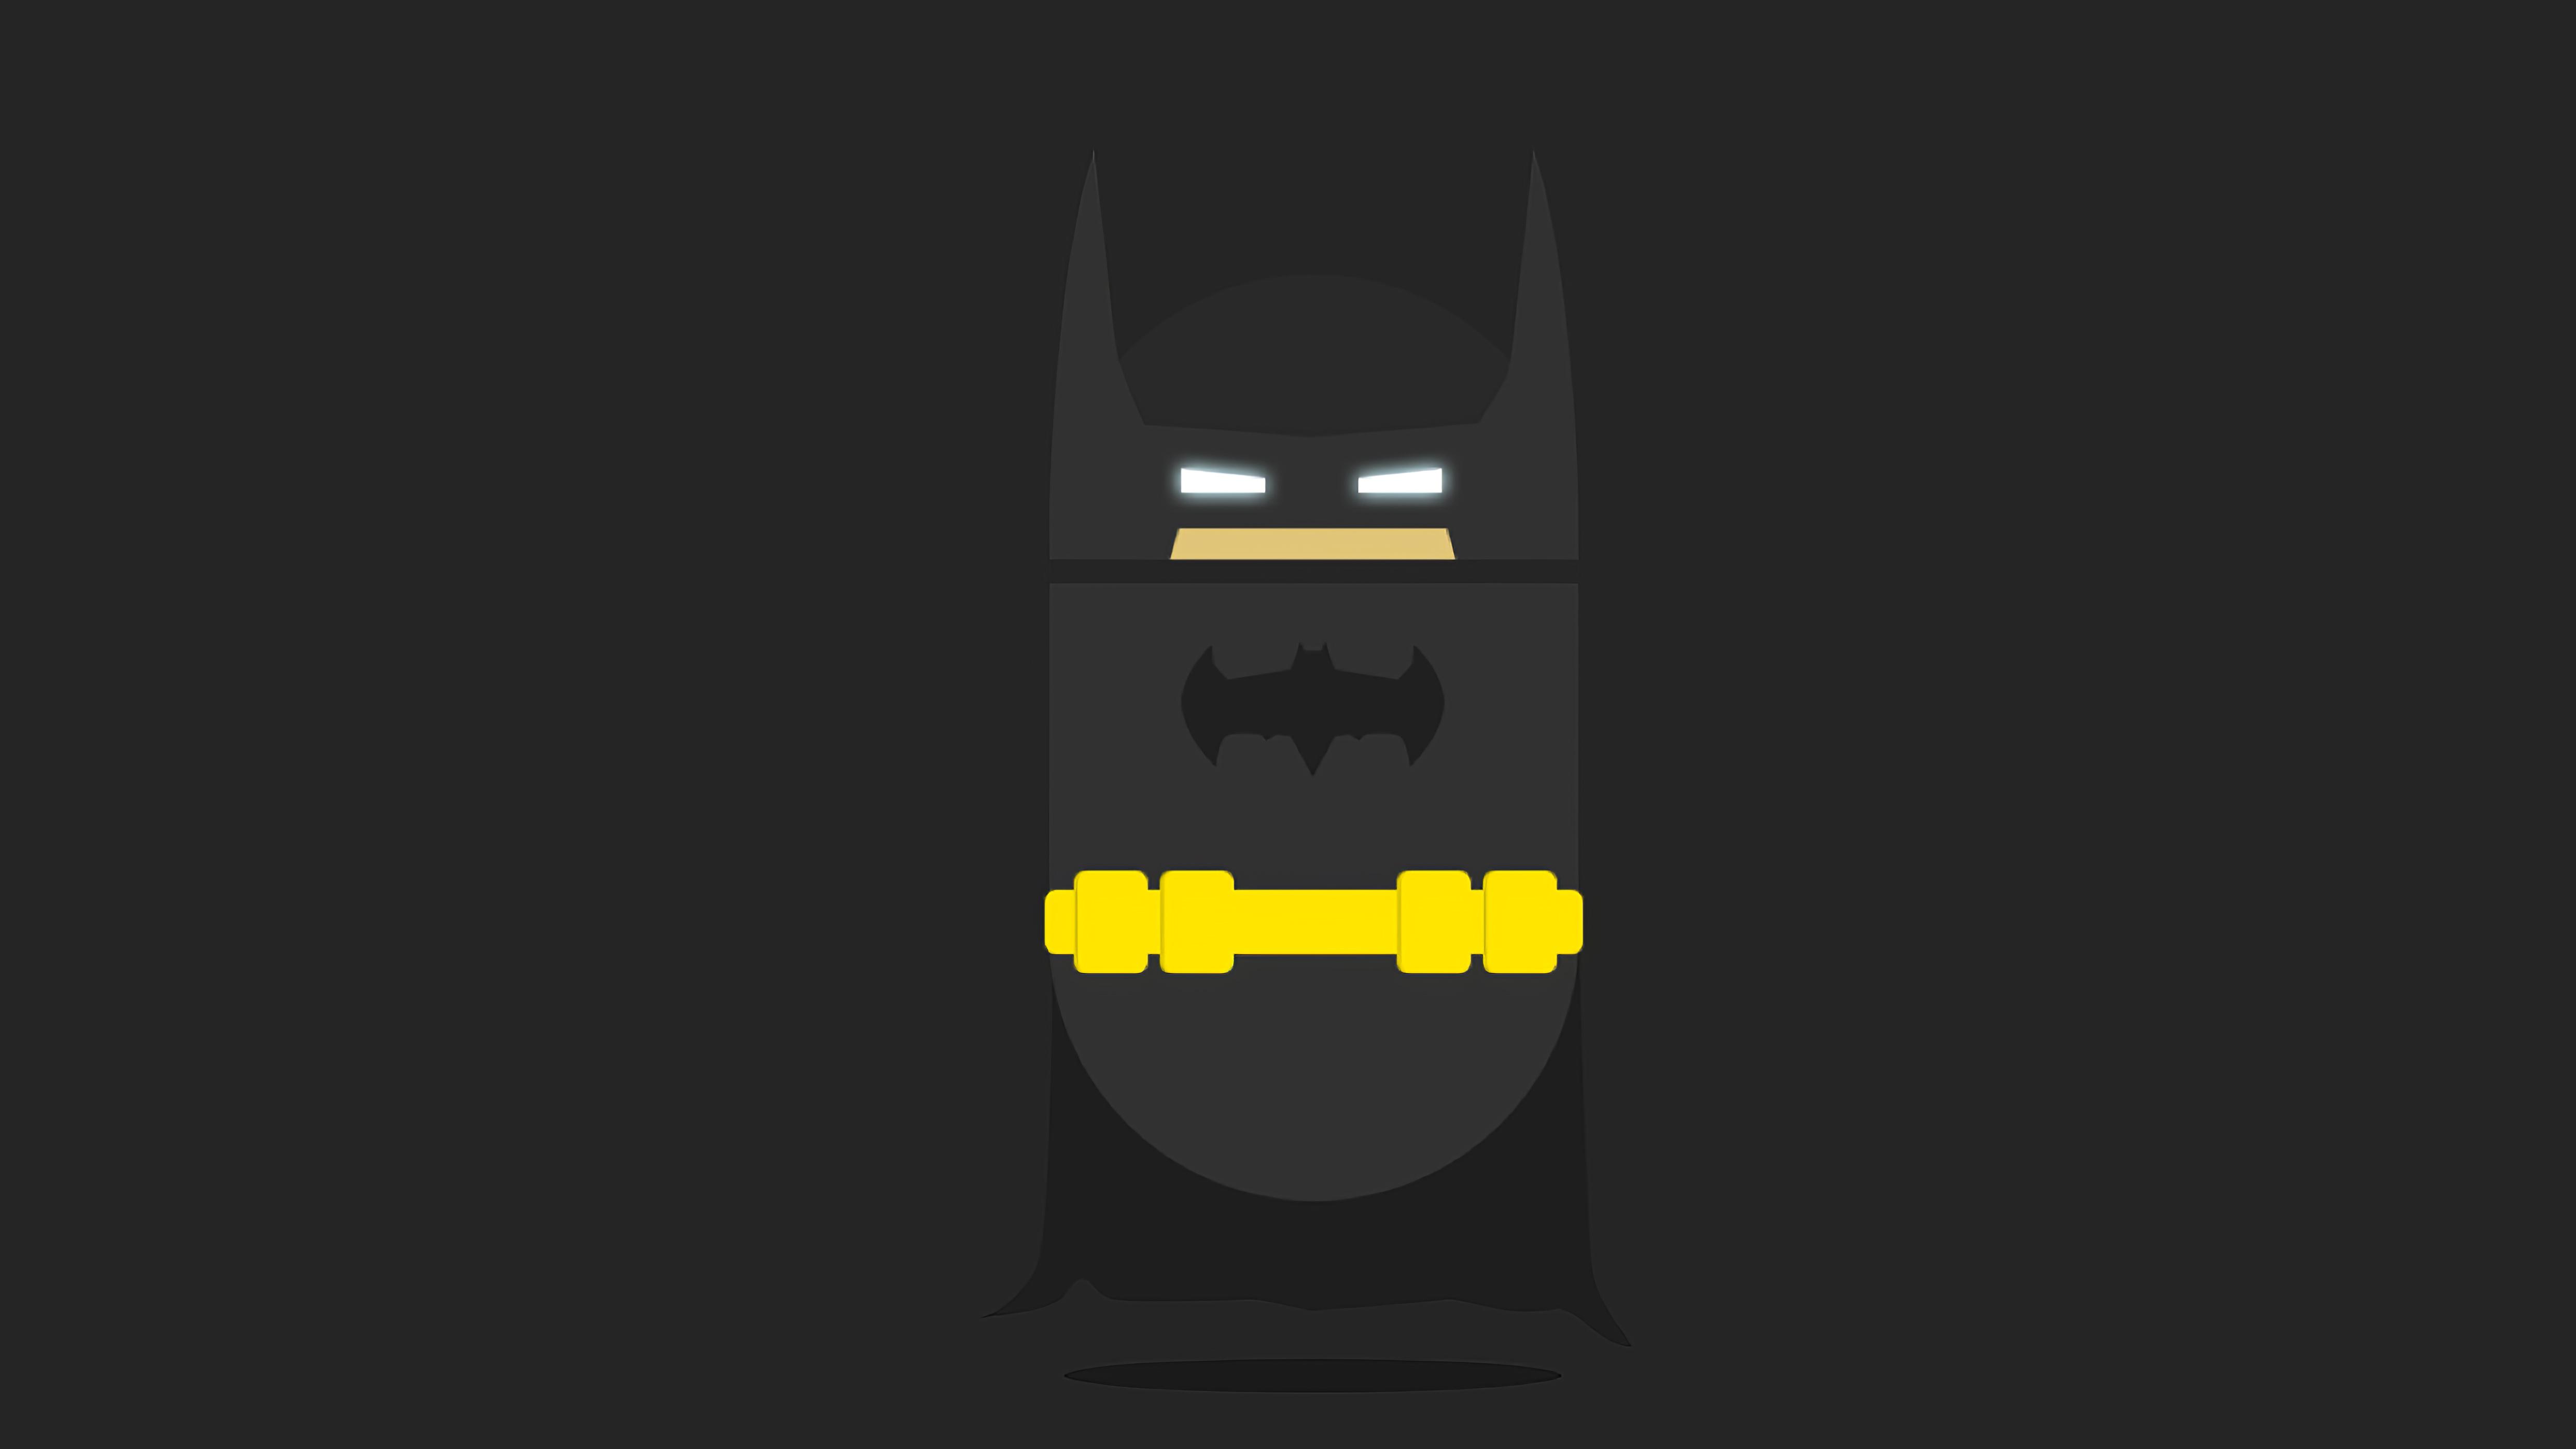 batman minimal art 1576097995 - Batman Minimal Art - dark knight wallpaper 4k, batman wallpaper phone hd 4k, batman wallpaper 4k, Batman minimalist 4k hd wallpaper, batman art wallpaper 4k